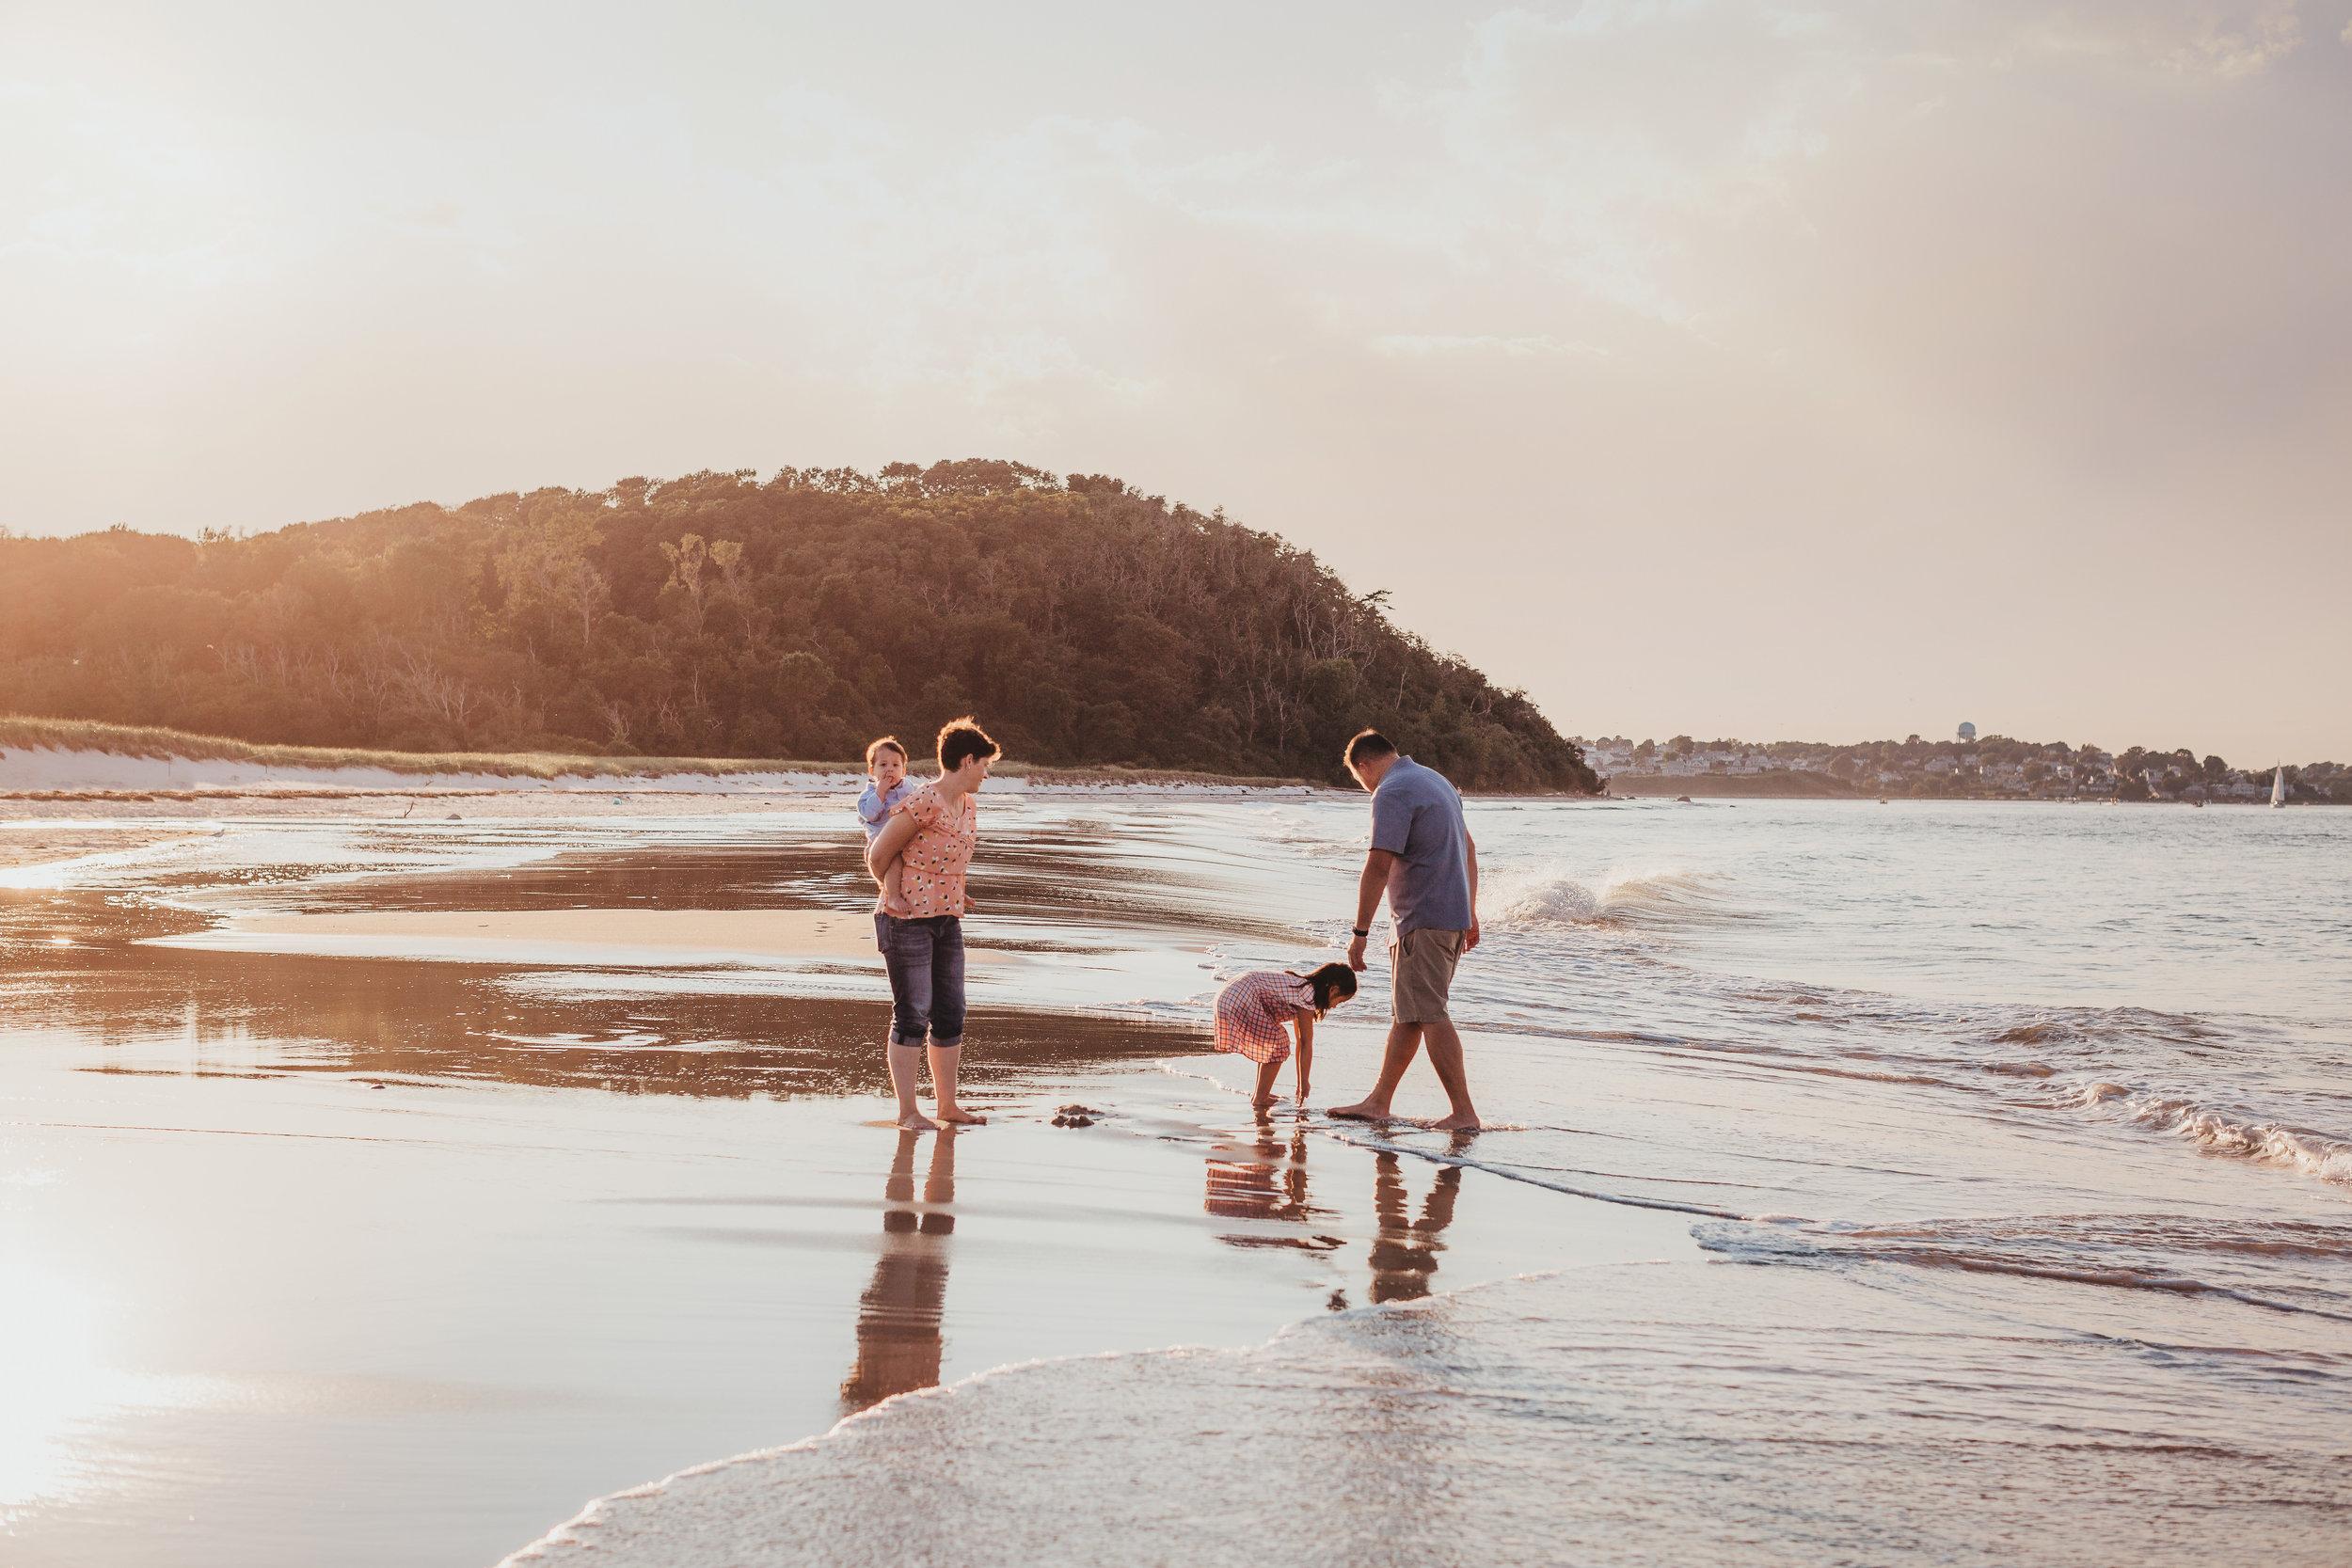 sudbury-ma-family-photographer-more-than-holiday-card.jpg